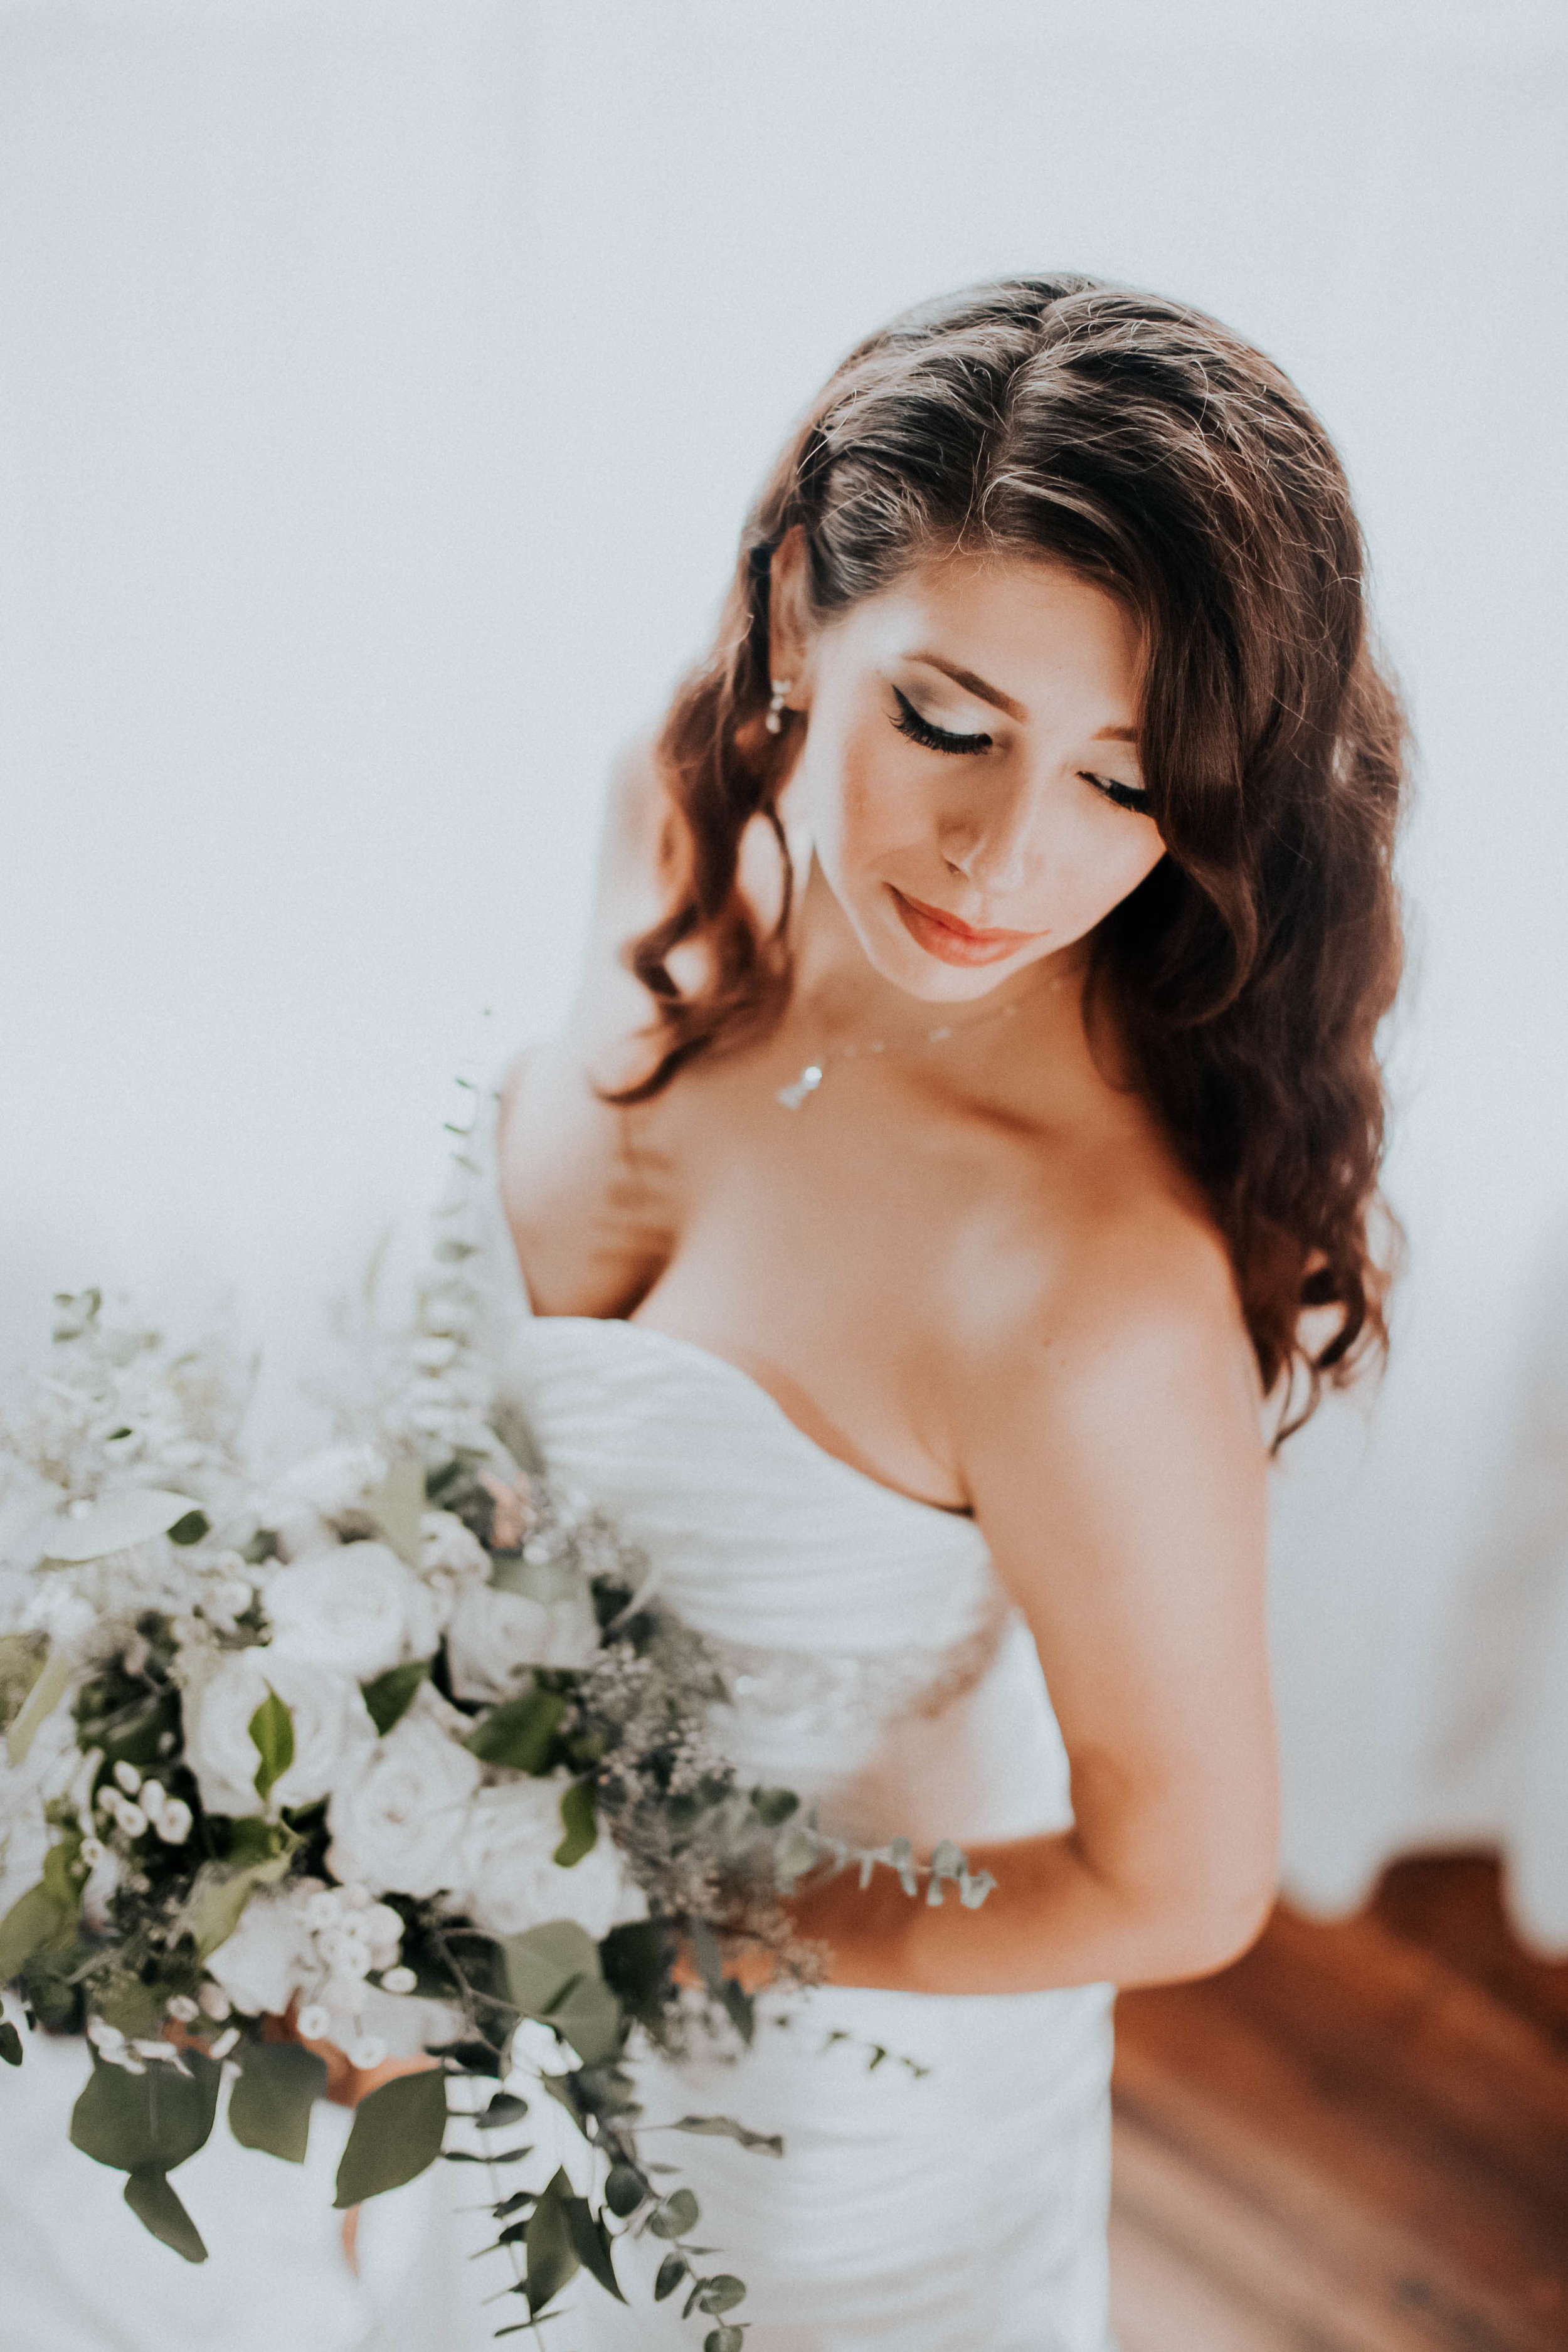 Houston Texas Engagment and Wedding Photographer-0300.jpg